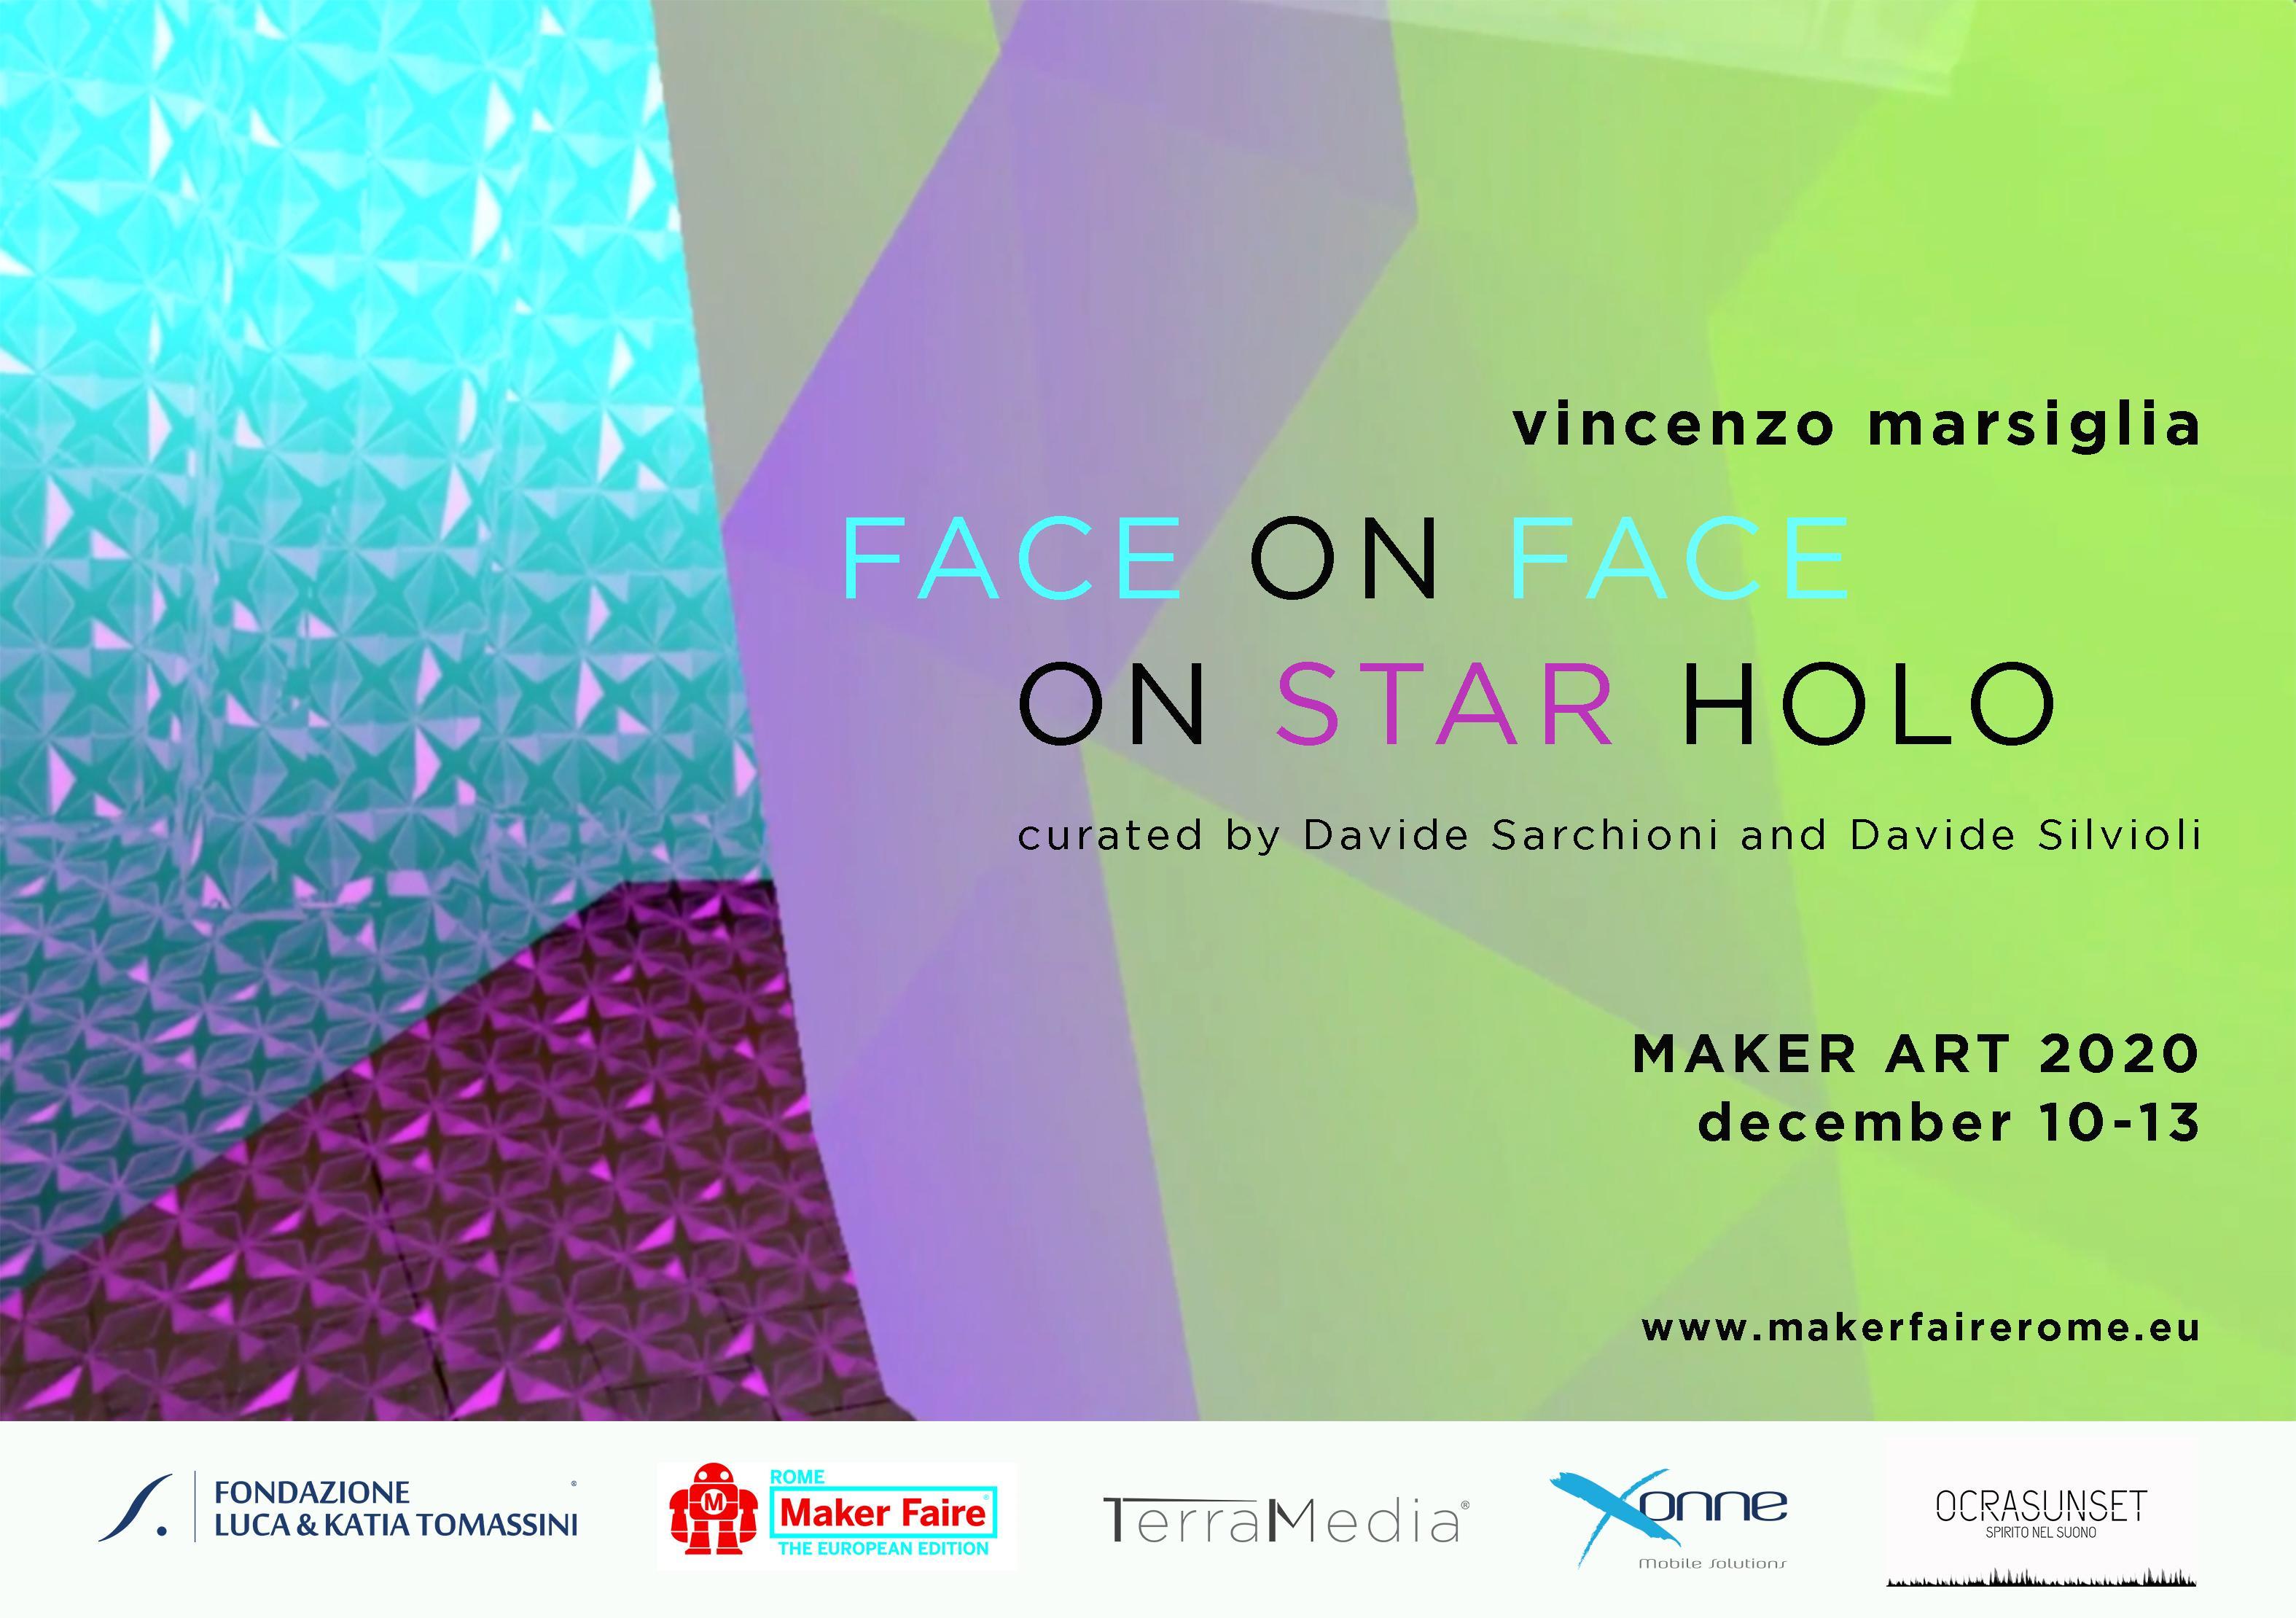 Vincenzo Marsiglia - FACE ON FACE ON STAR HOLO